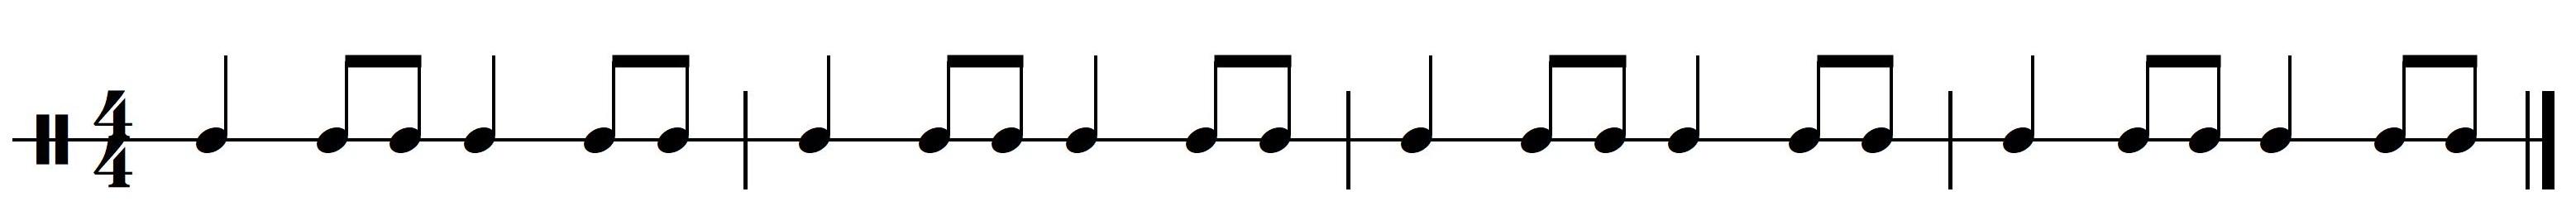 Ritme 2a. Basisritme 2 uit meespeelpartituur Dance Monkey